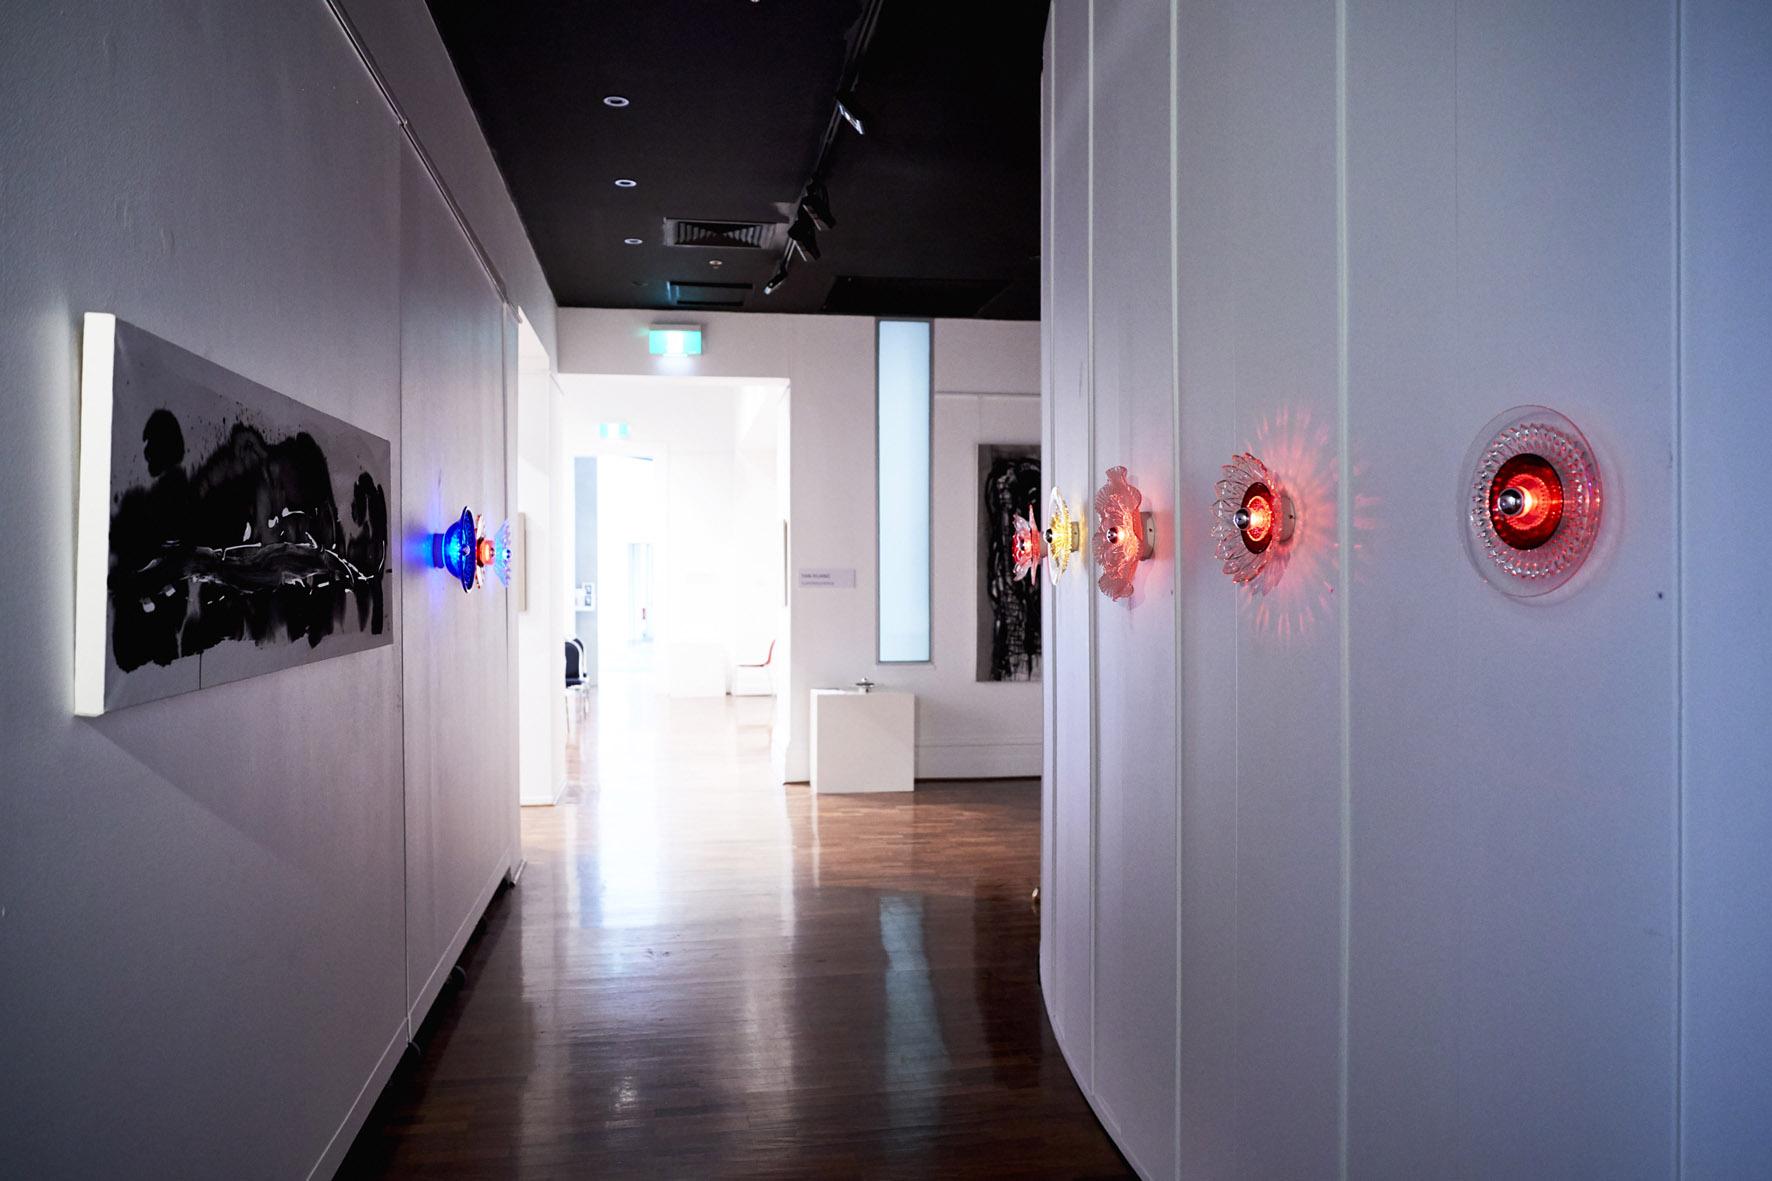 Luminescence exhibition at St Kilda Town Hall